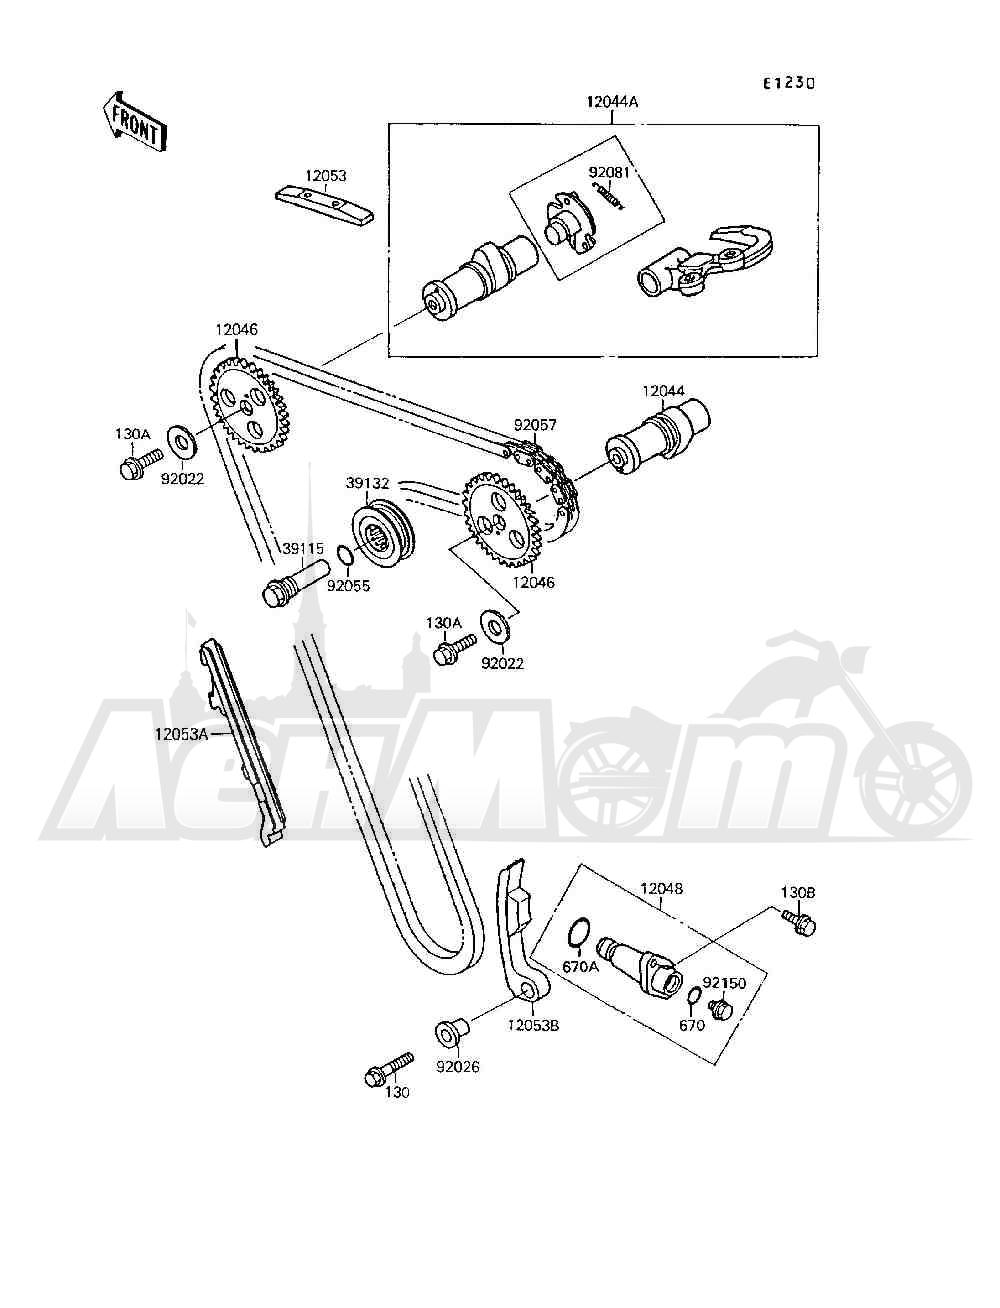 Запчасти для Квадроцикла Kawasaki 1994 MOJAVE 250 (KSF250-A8) Раздел: CAMSHAFT(S) / TENSIONER   распредвал (S)/натяжитель